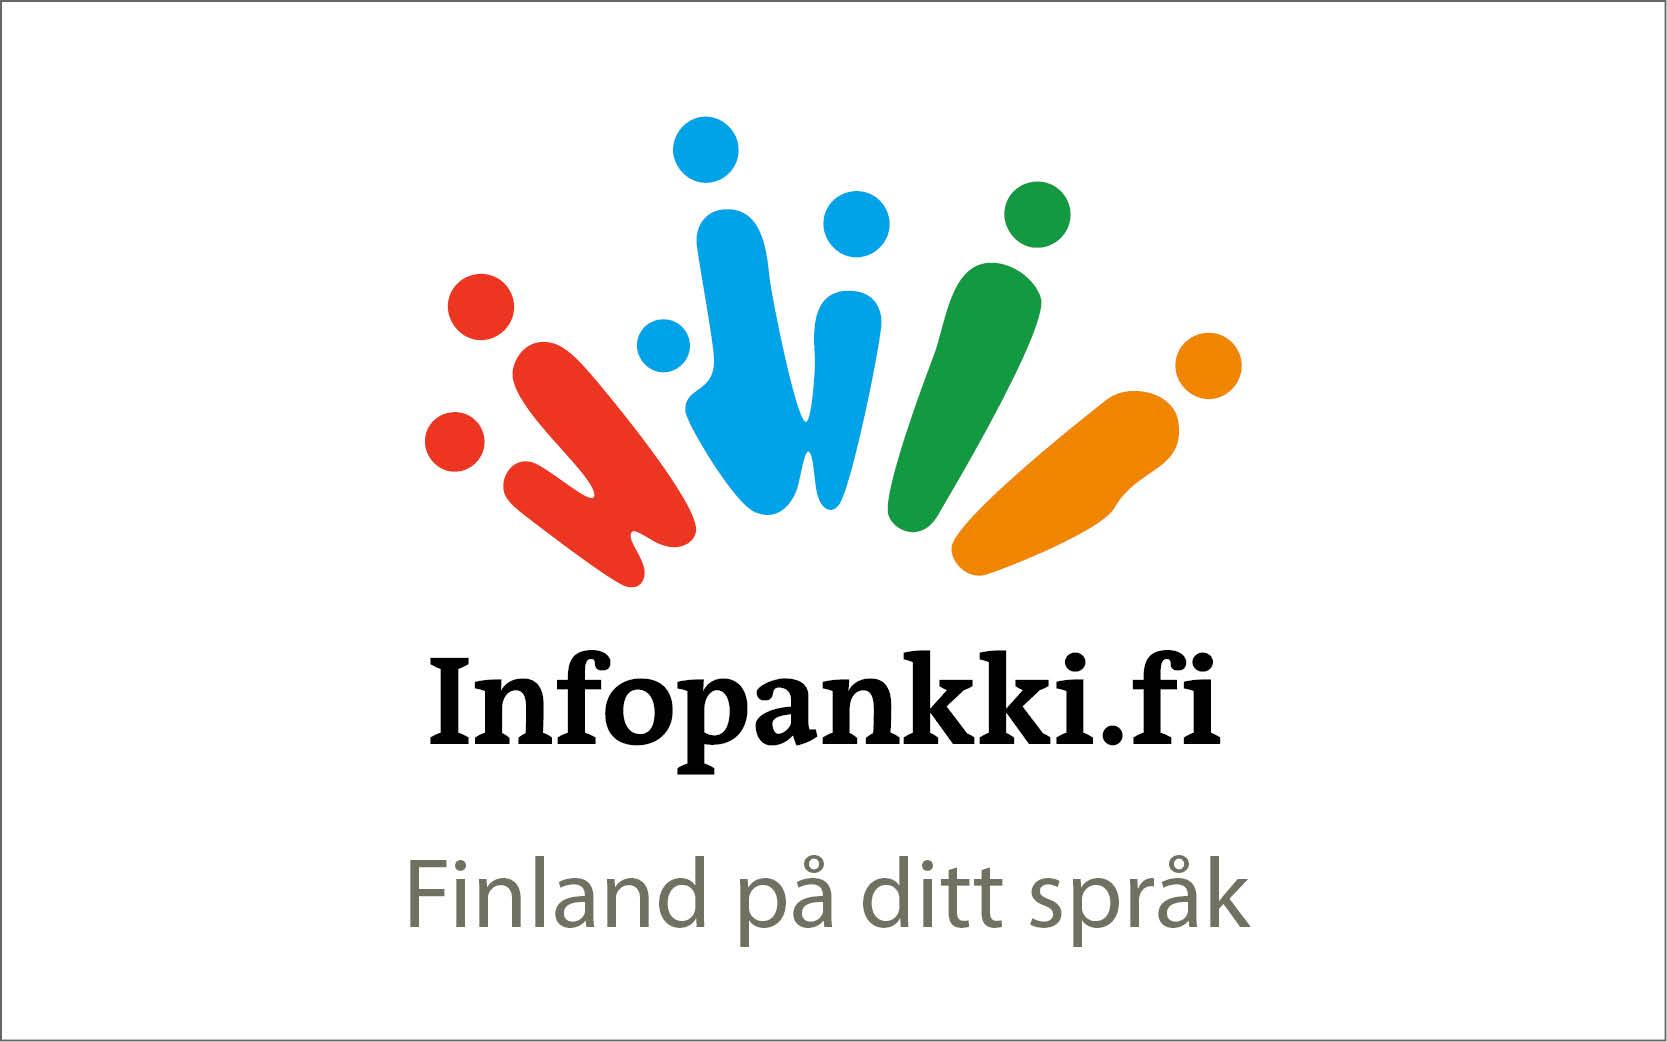 Infopankki.fi - Information om bibliotek på 12 språk